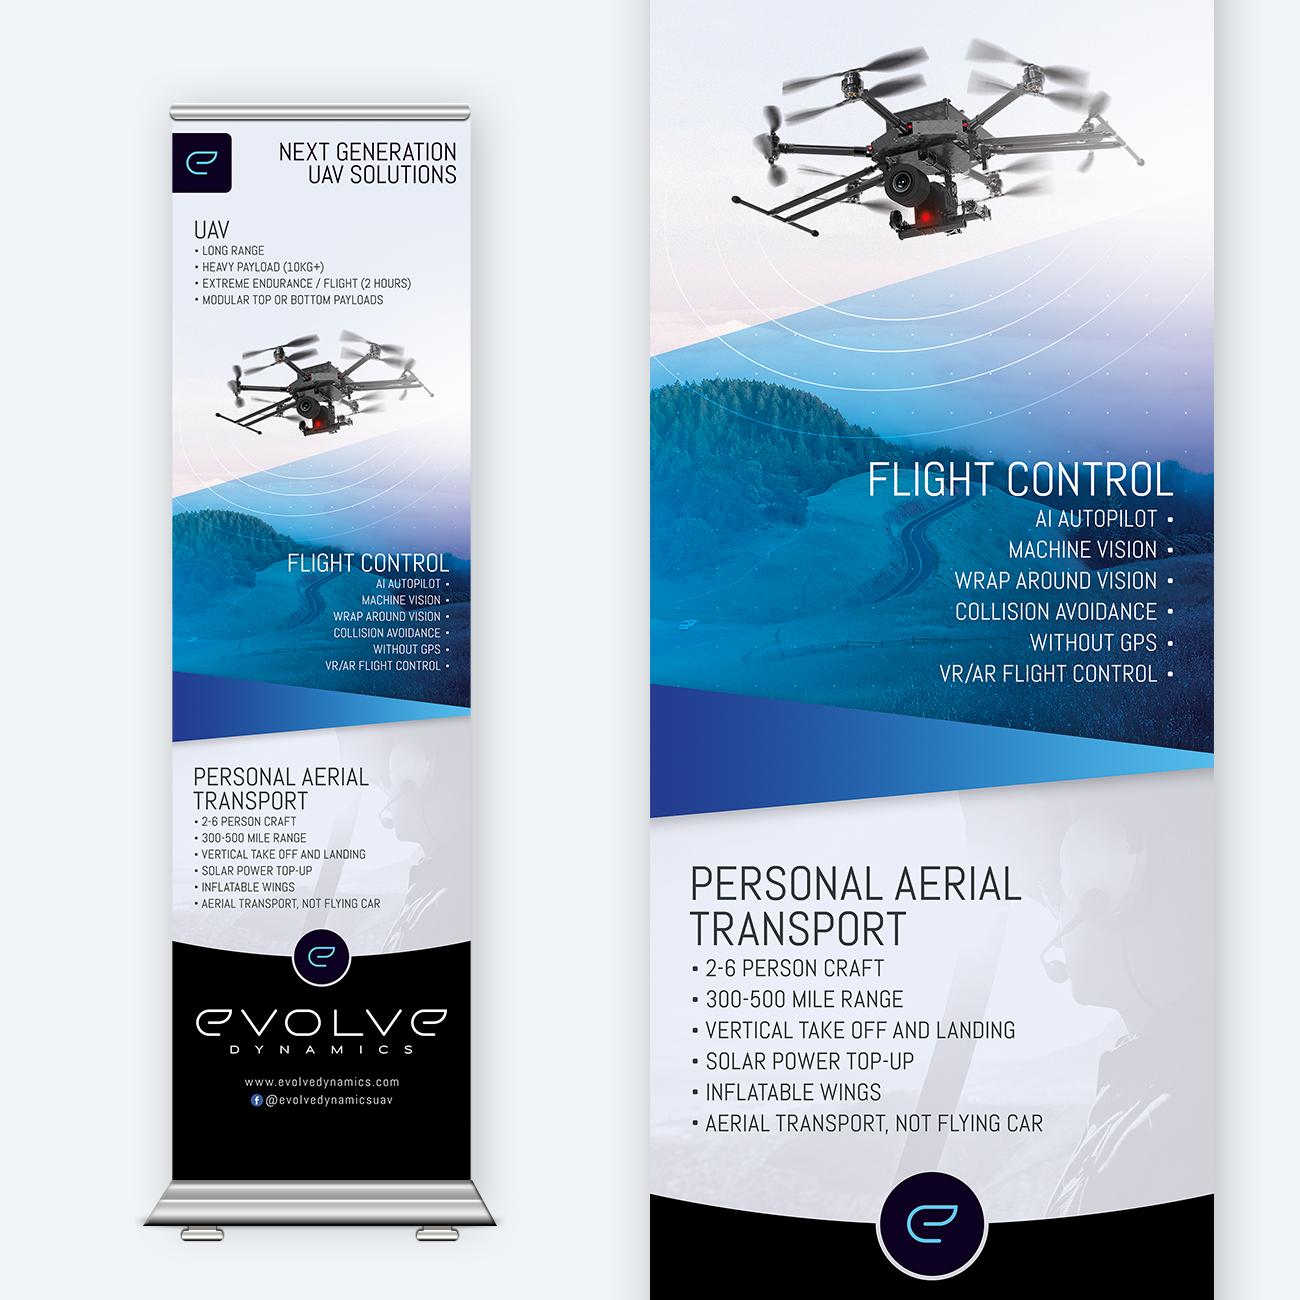 Evolve Dynamics Rollup Banner